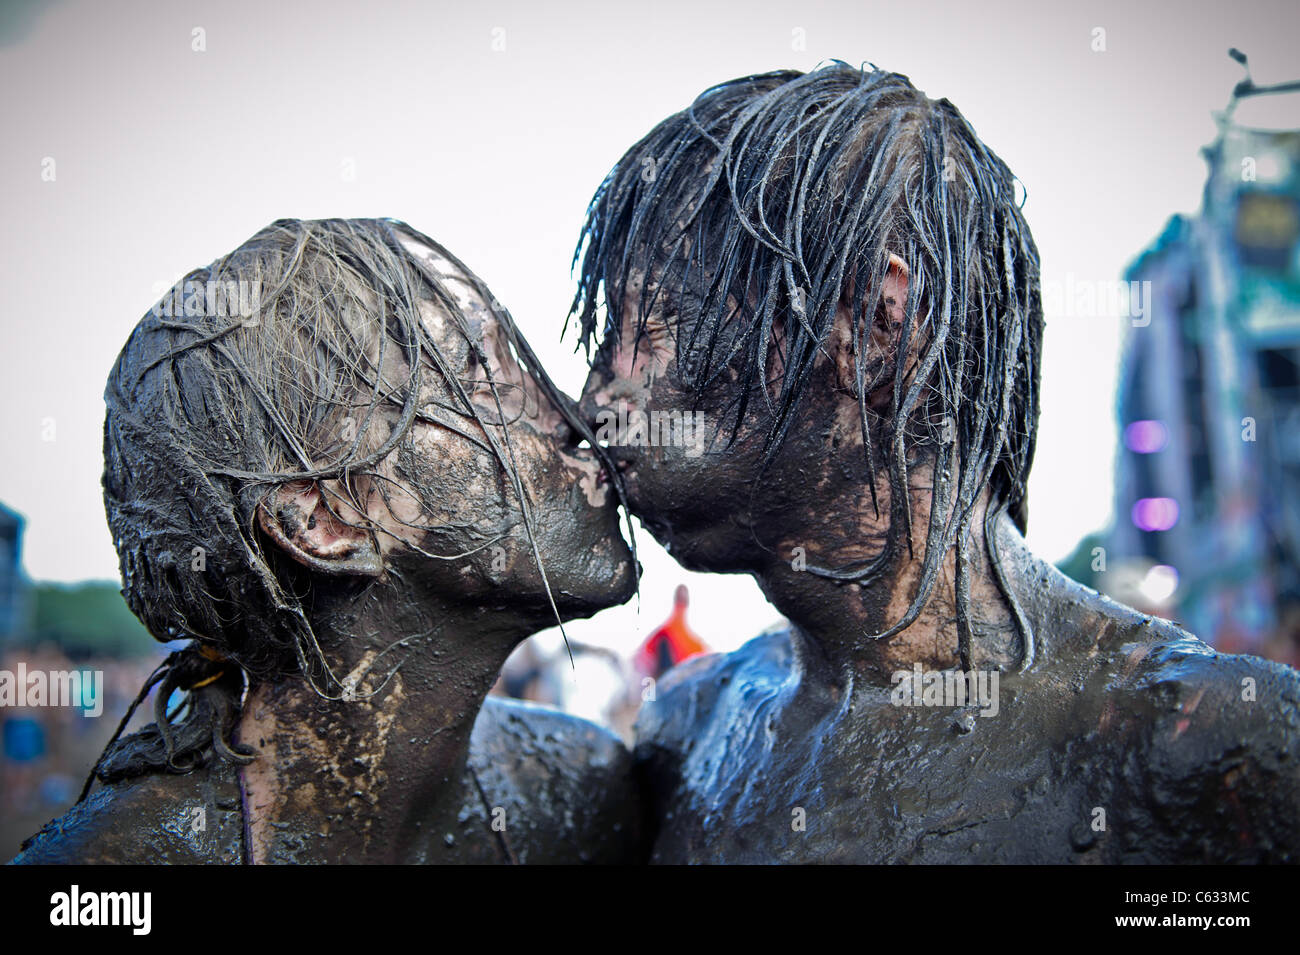 junges Paar küssen bedeckt im Schlamm am Przystanek Woodstock - Europas größtes Open-Air-Festival Stockbild